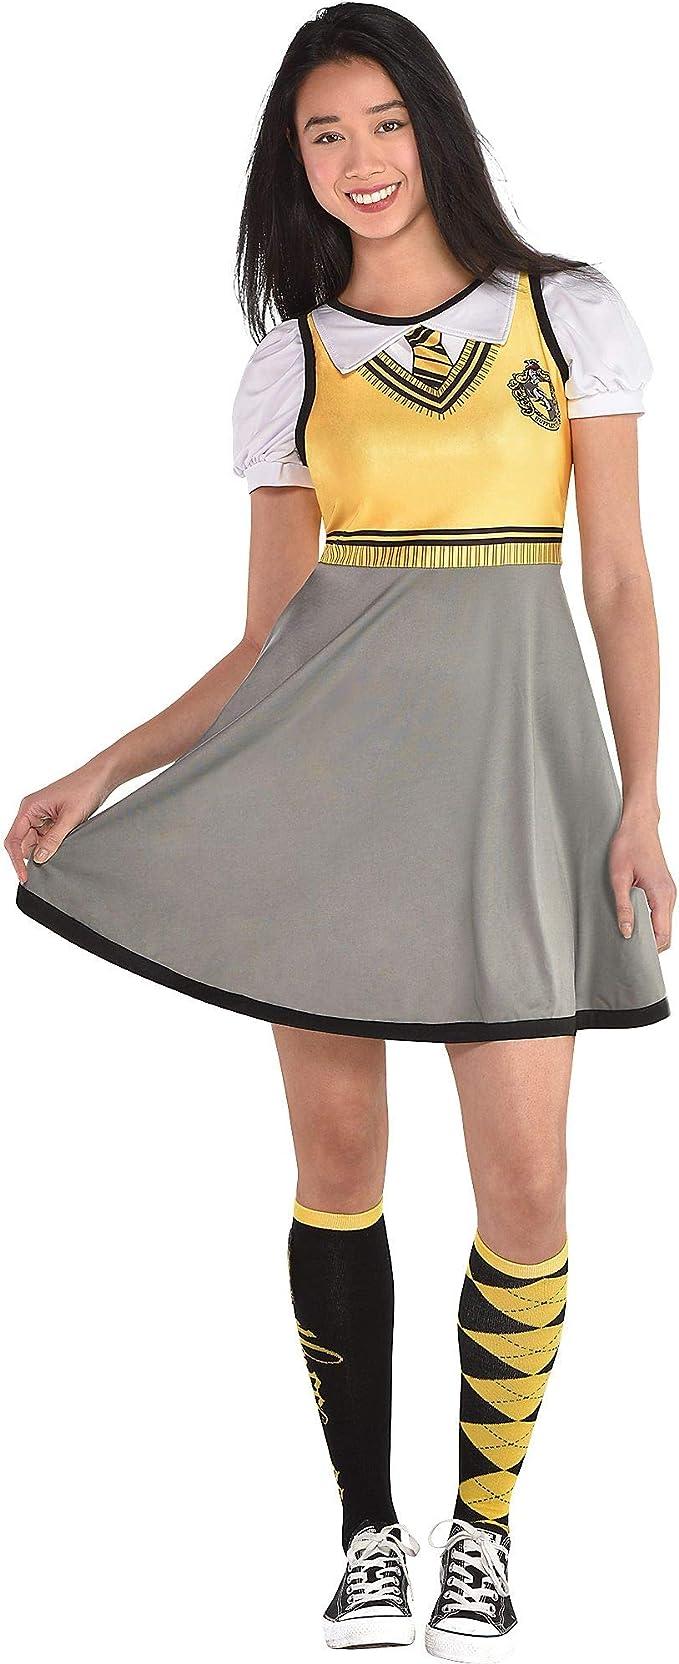 Disfraz de Harry Potter Hufflepuff para Mujer, tamaño estándar, se ...